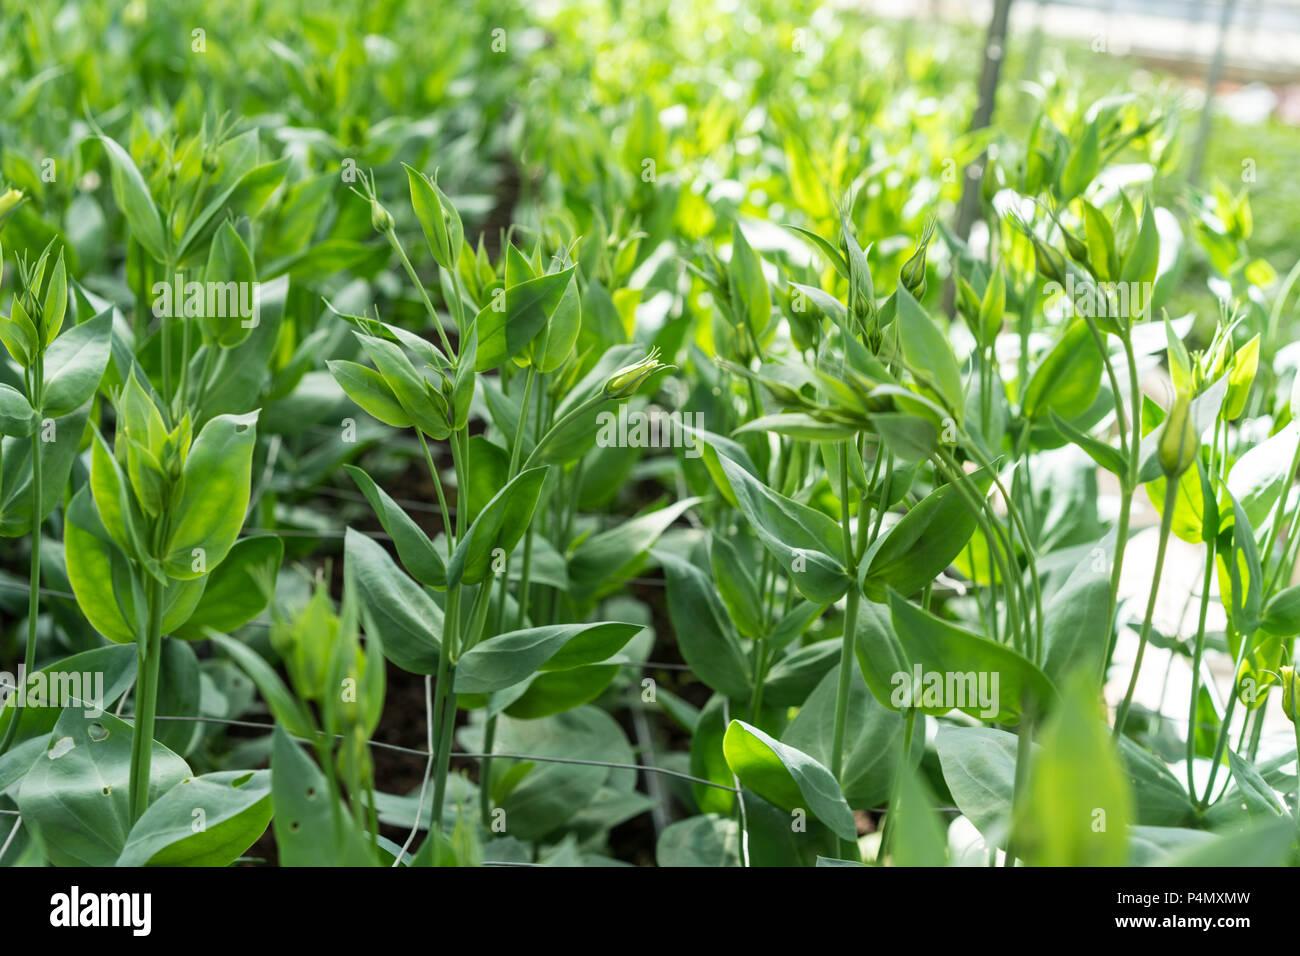 greenhouse full of lisianthus grandiflorum plants - Stock Image